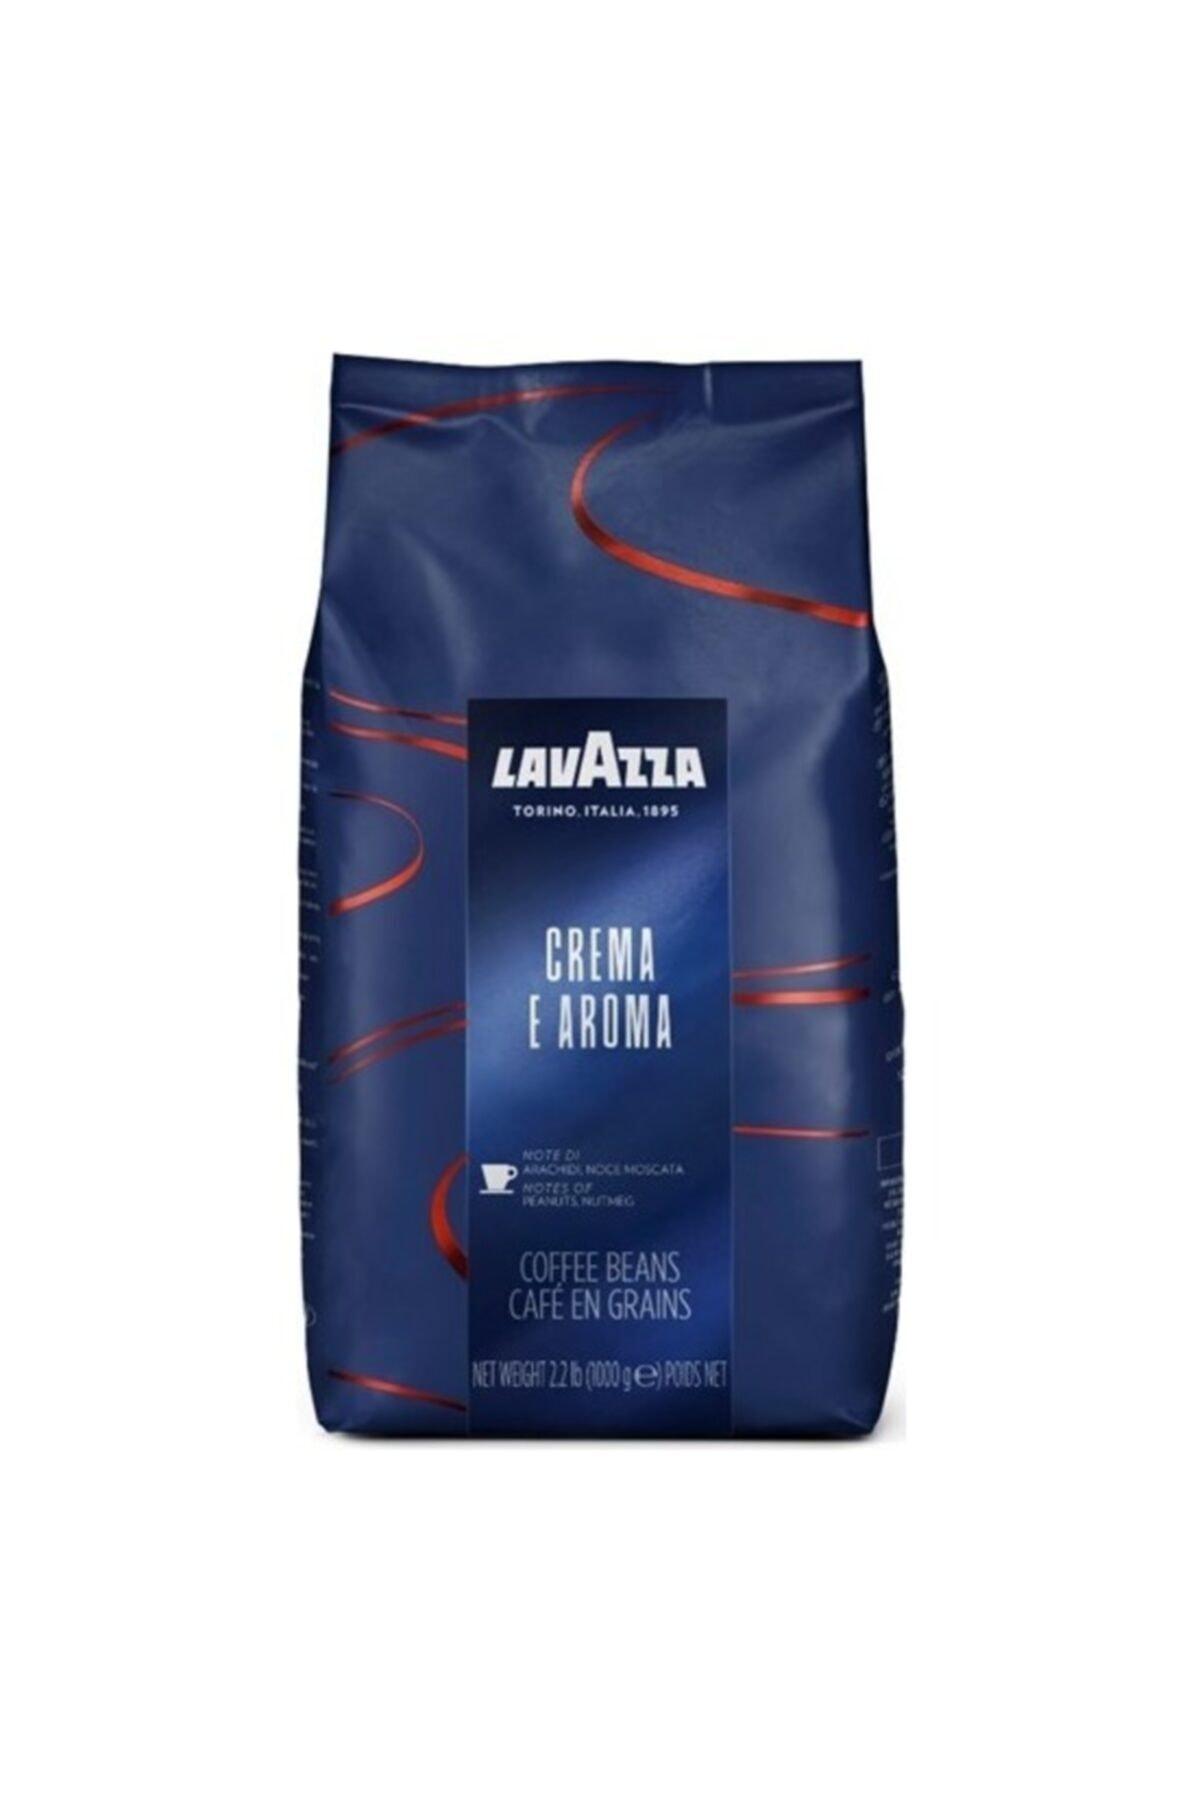 LavAzza Espresso Crema E Aroma Çekirdek Kahve 1 Kg 6'lı Koli 2